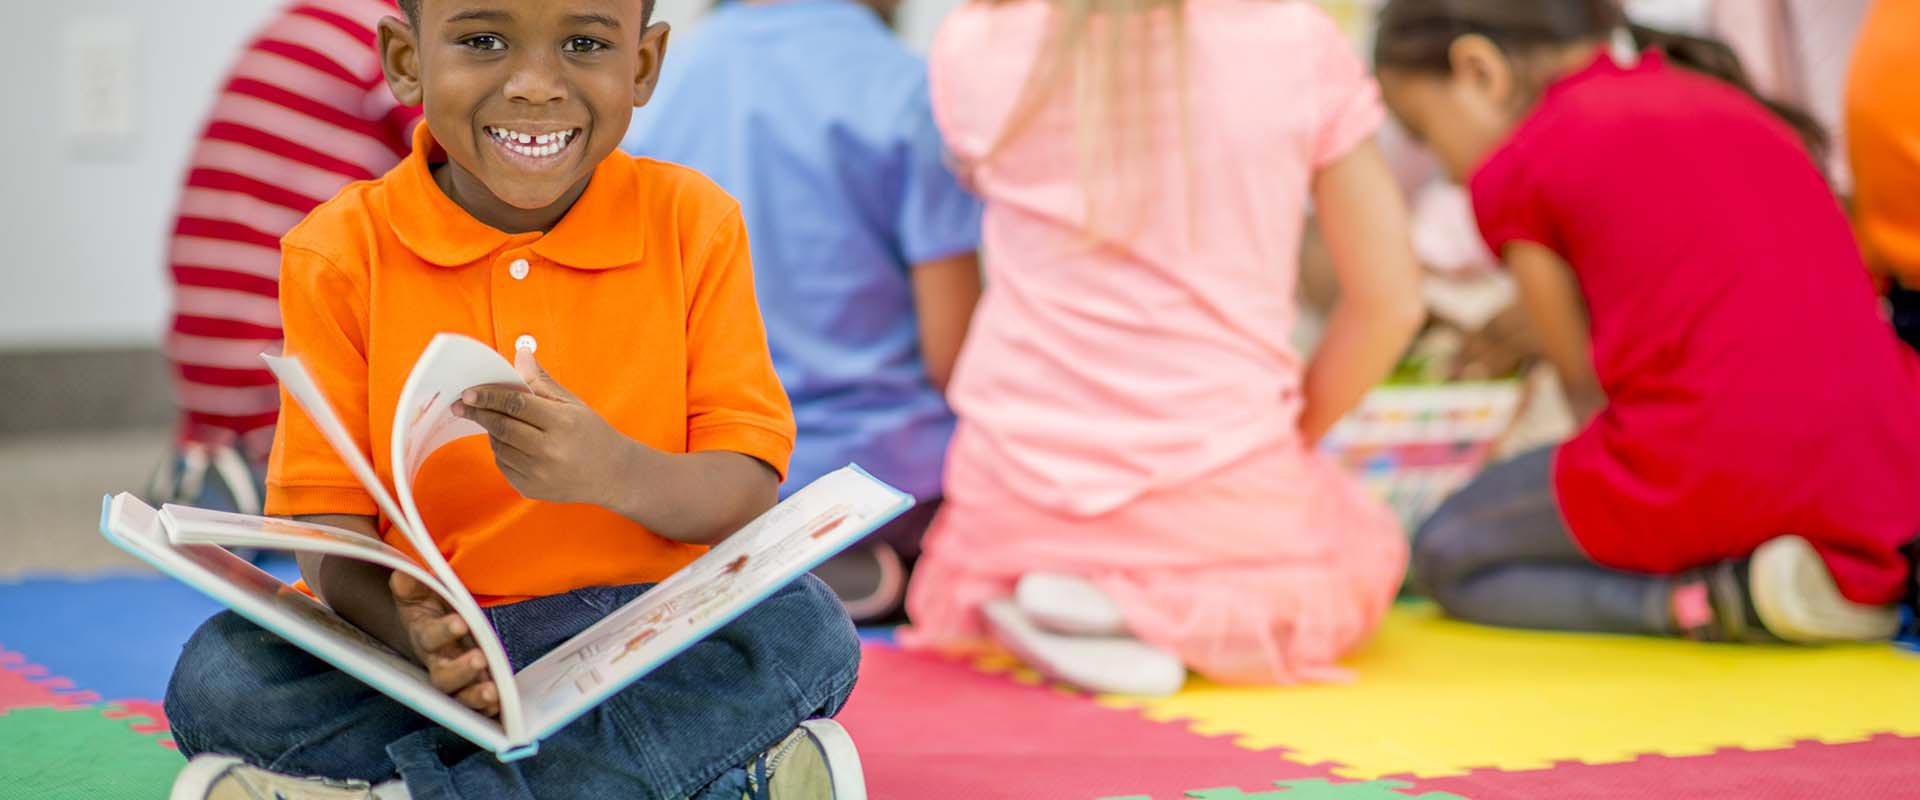 Randolph County Schools Calendar 2020 And 2021 throughout Dare County 2022 2023 Calendar